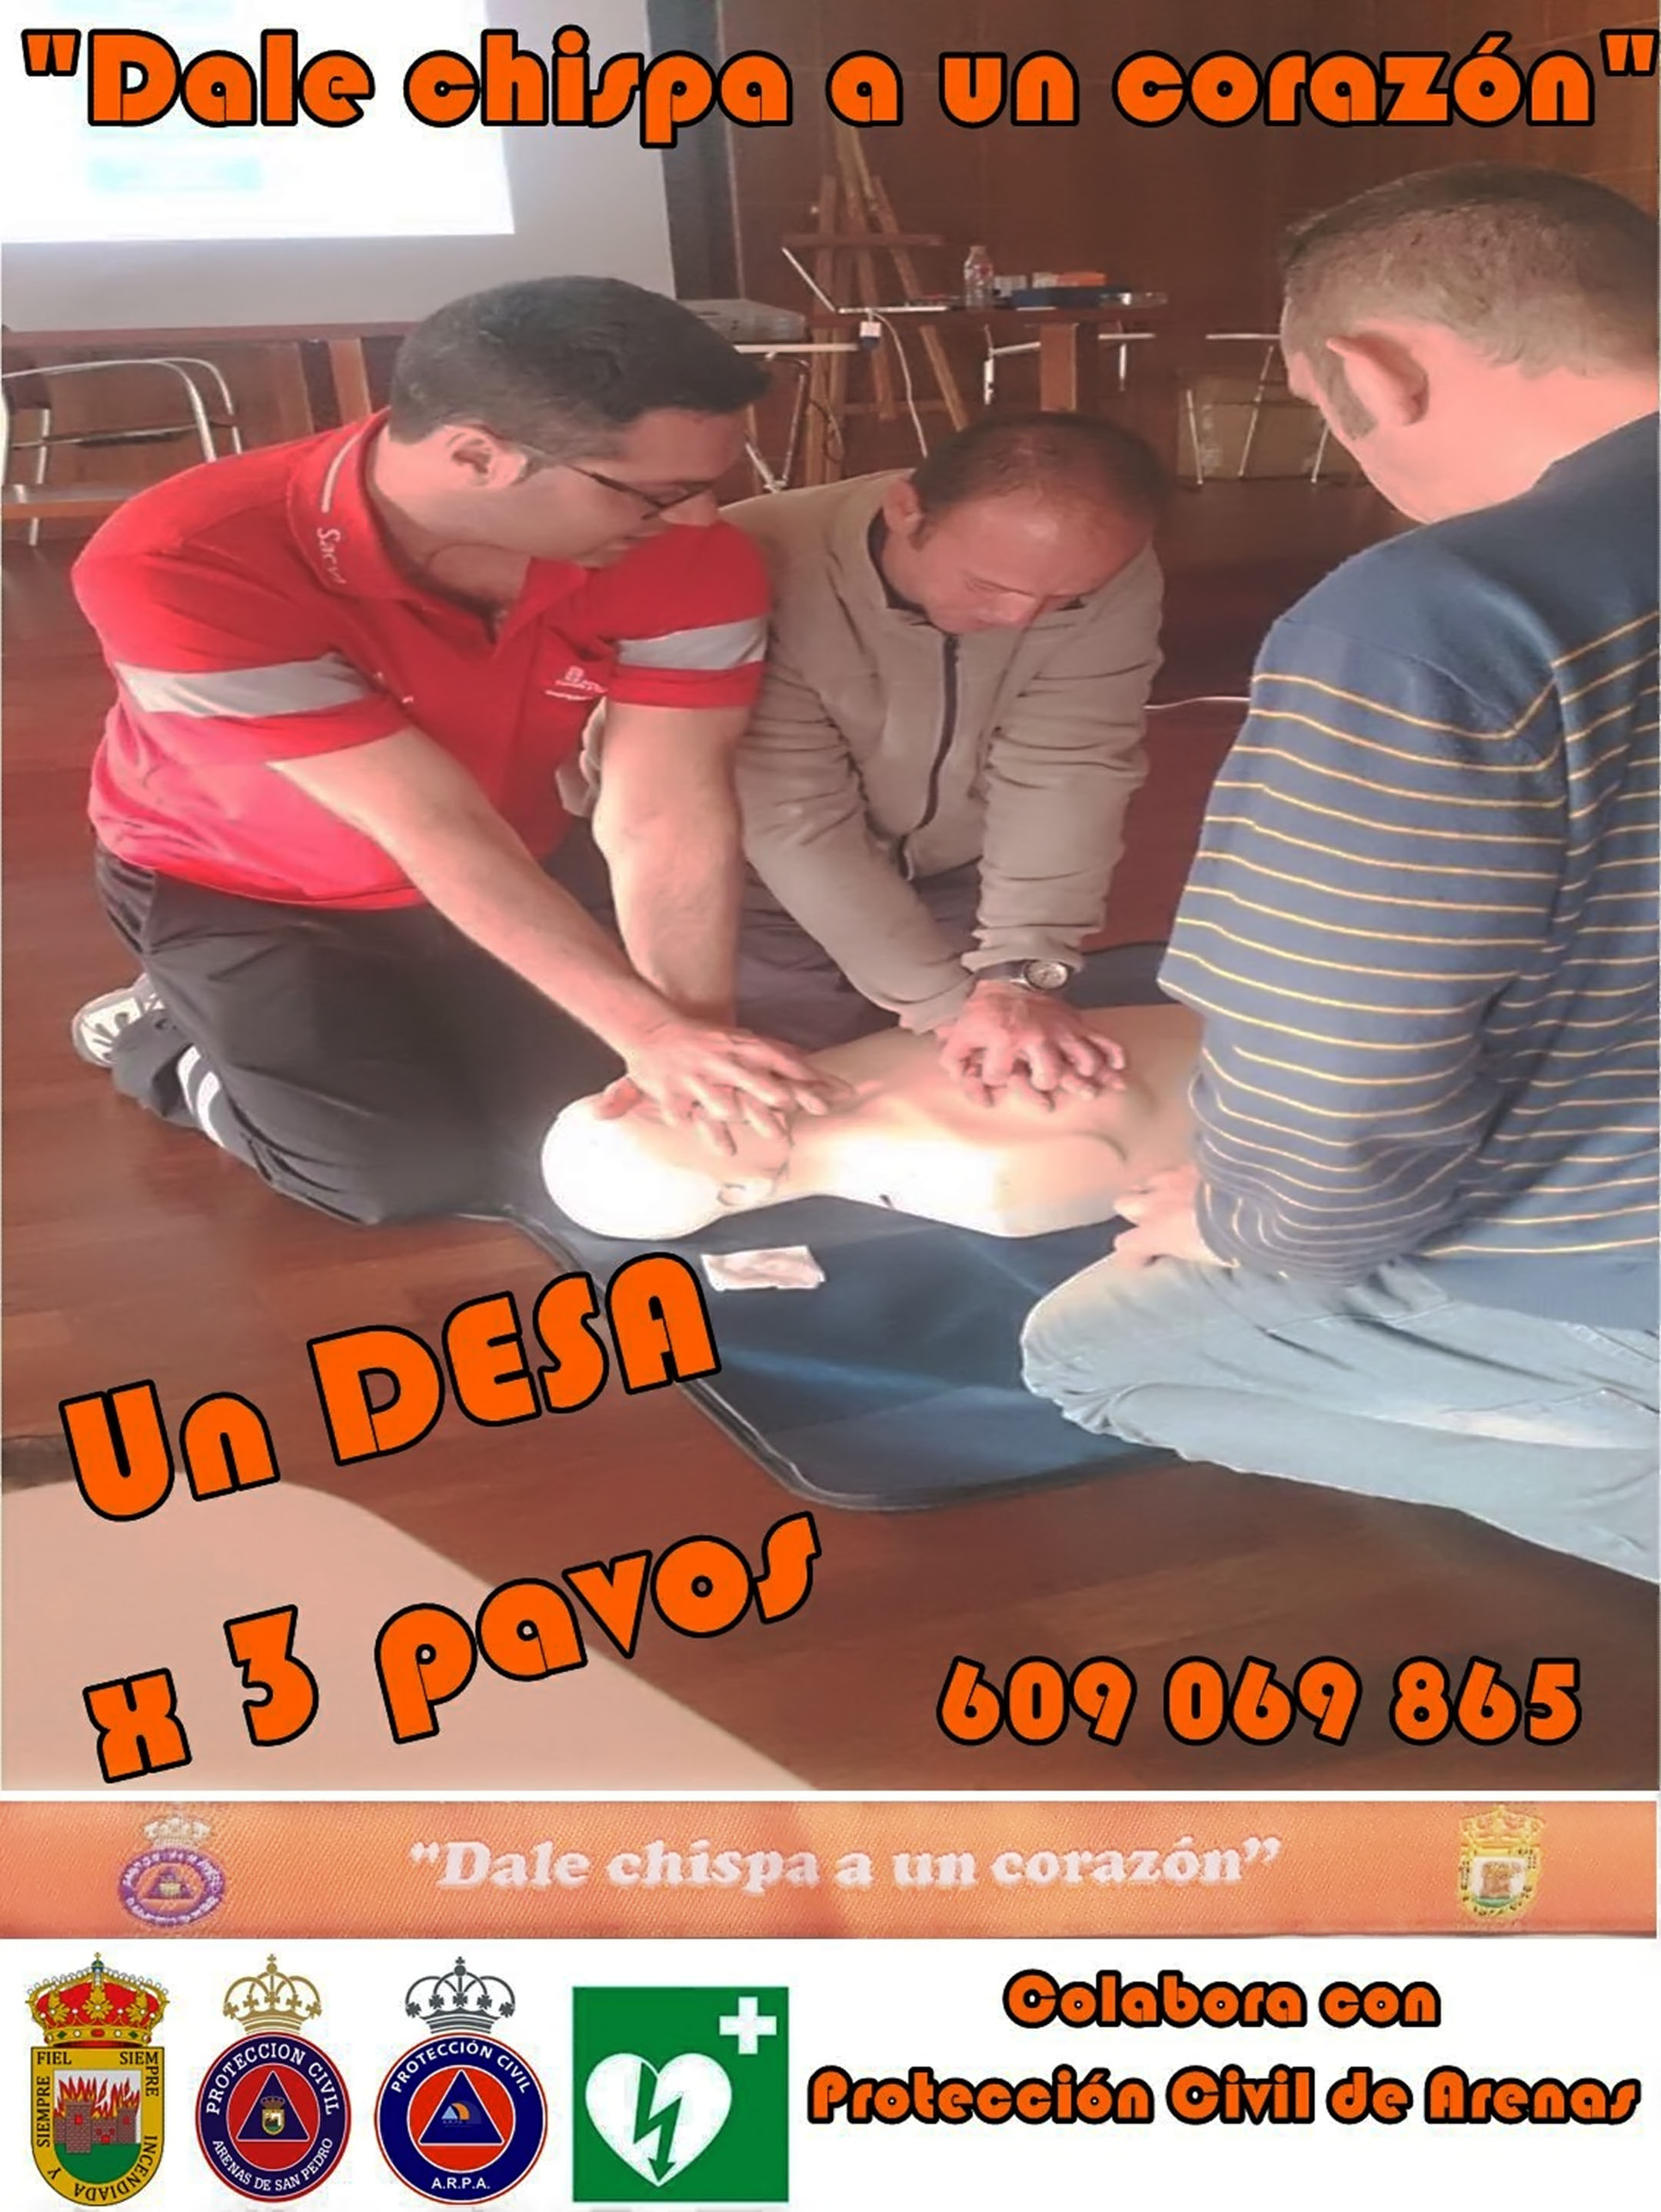 Desfibrilador Externo Semiautomático (DESA) para Protección Civil de Arenas de San Pedro – TiétarTeVe